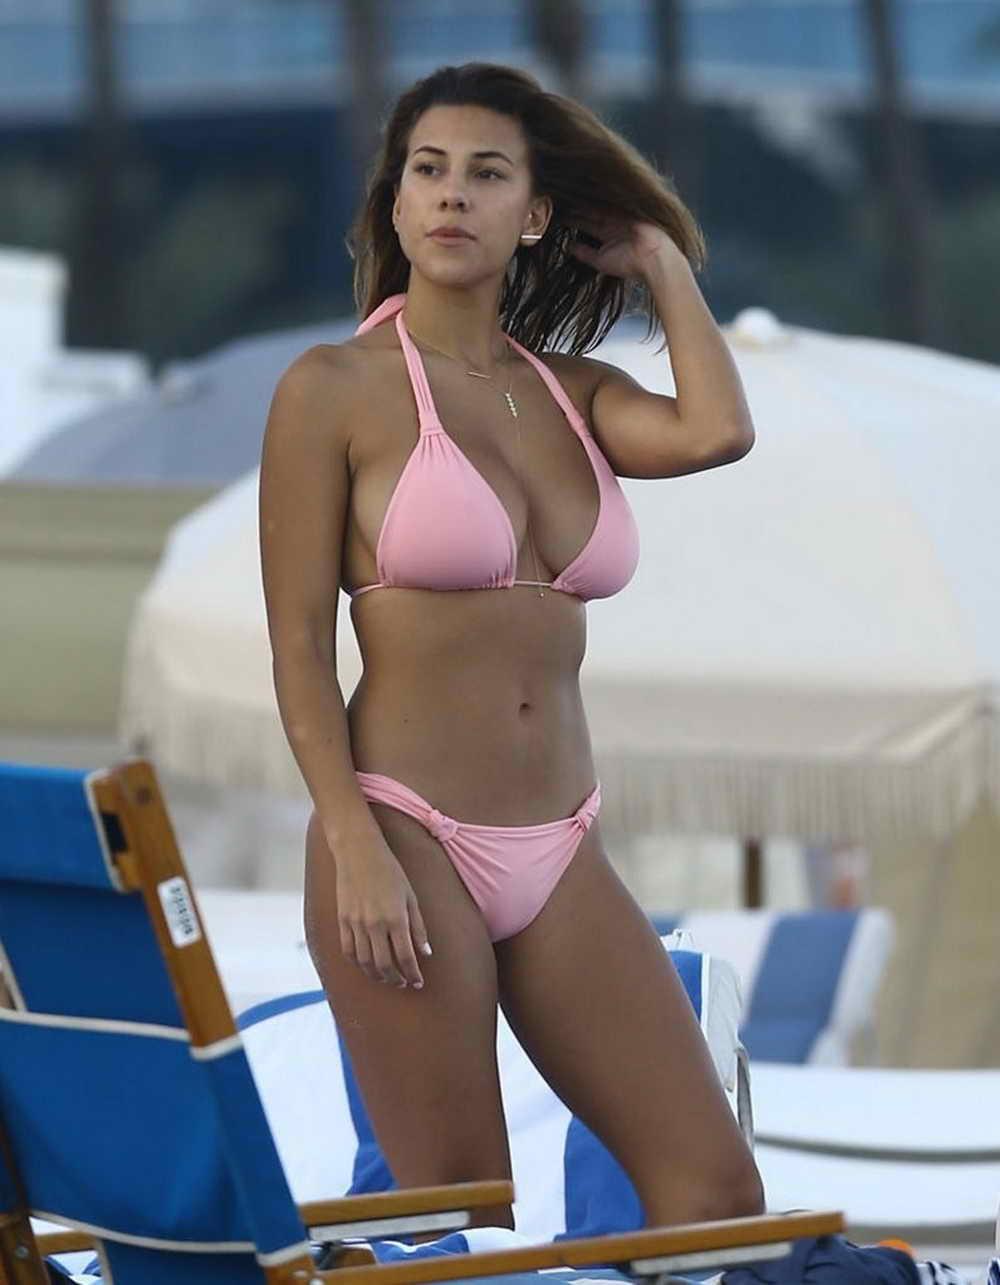 devin brugman in bikini at the beach in miami 12 30 15